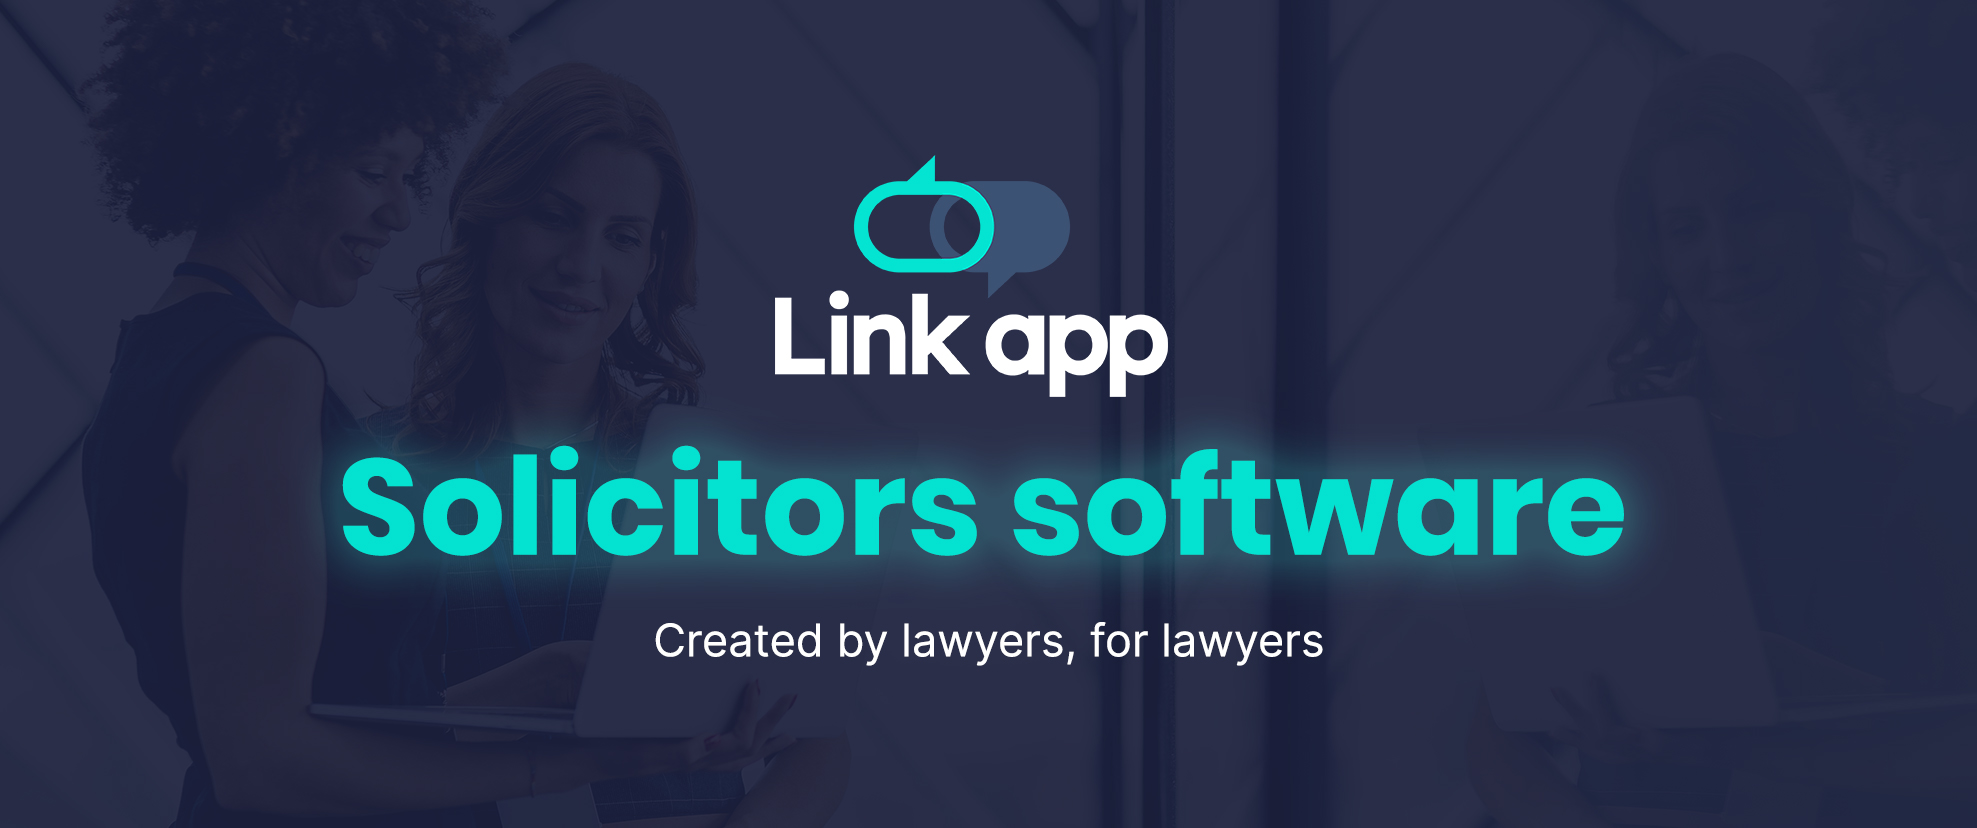 solicitors-software